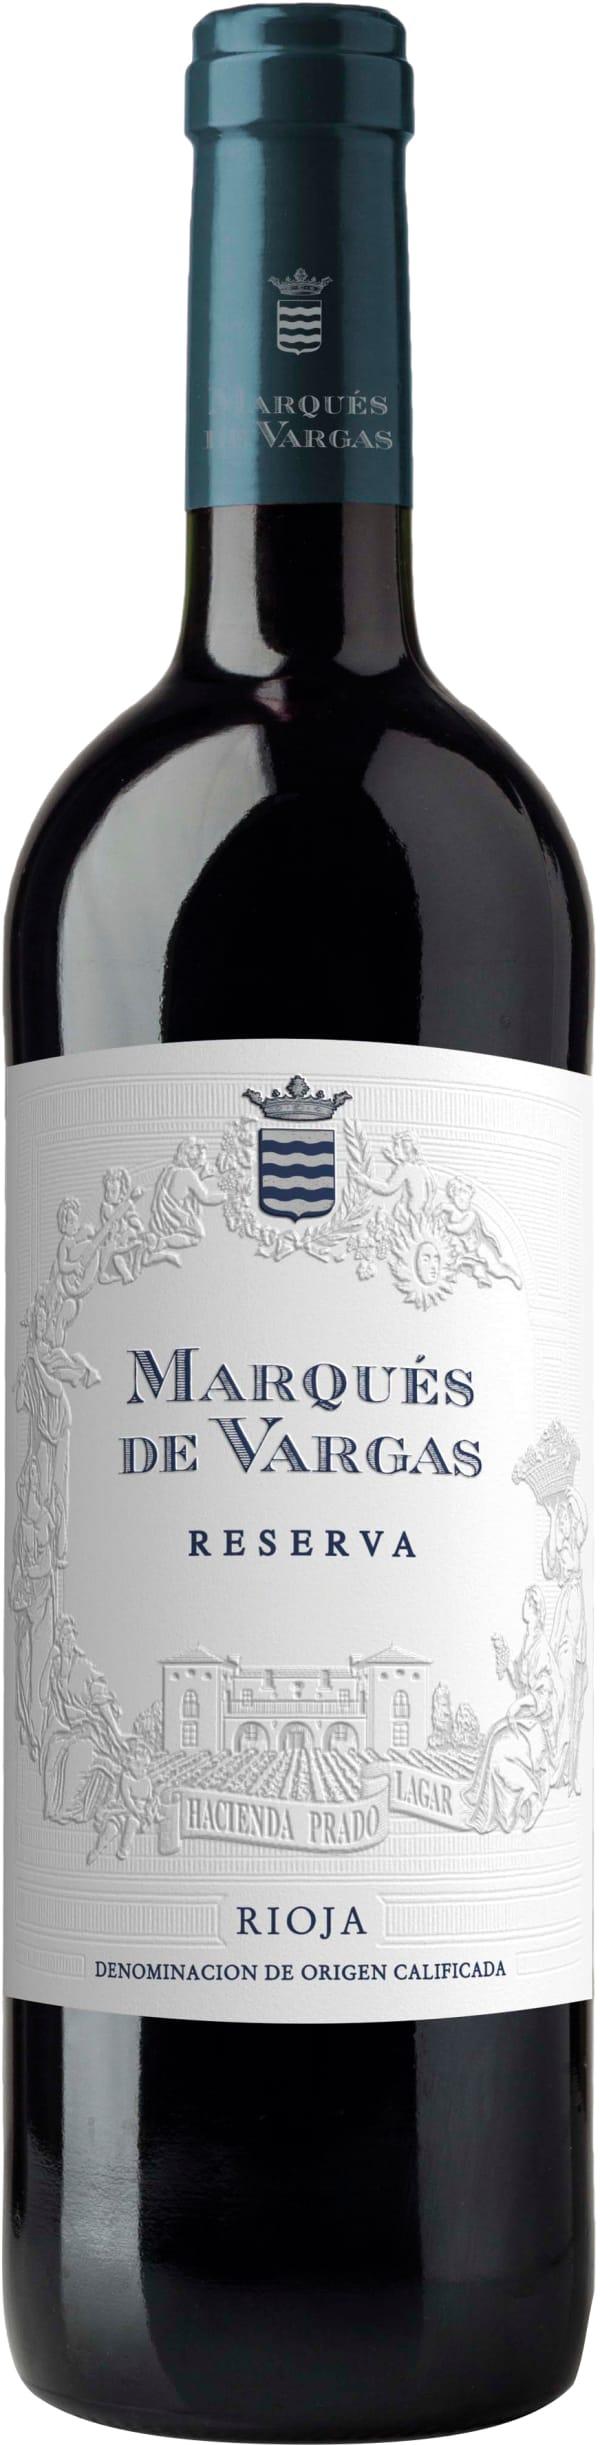 Marques de Vargas Reserva 2014